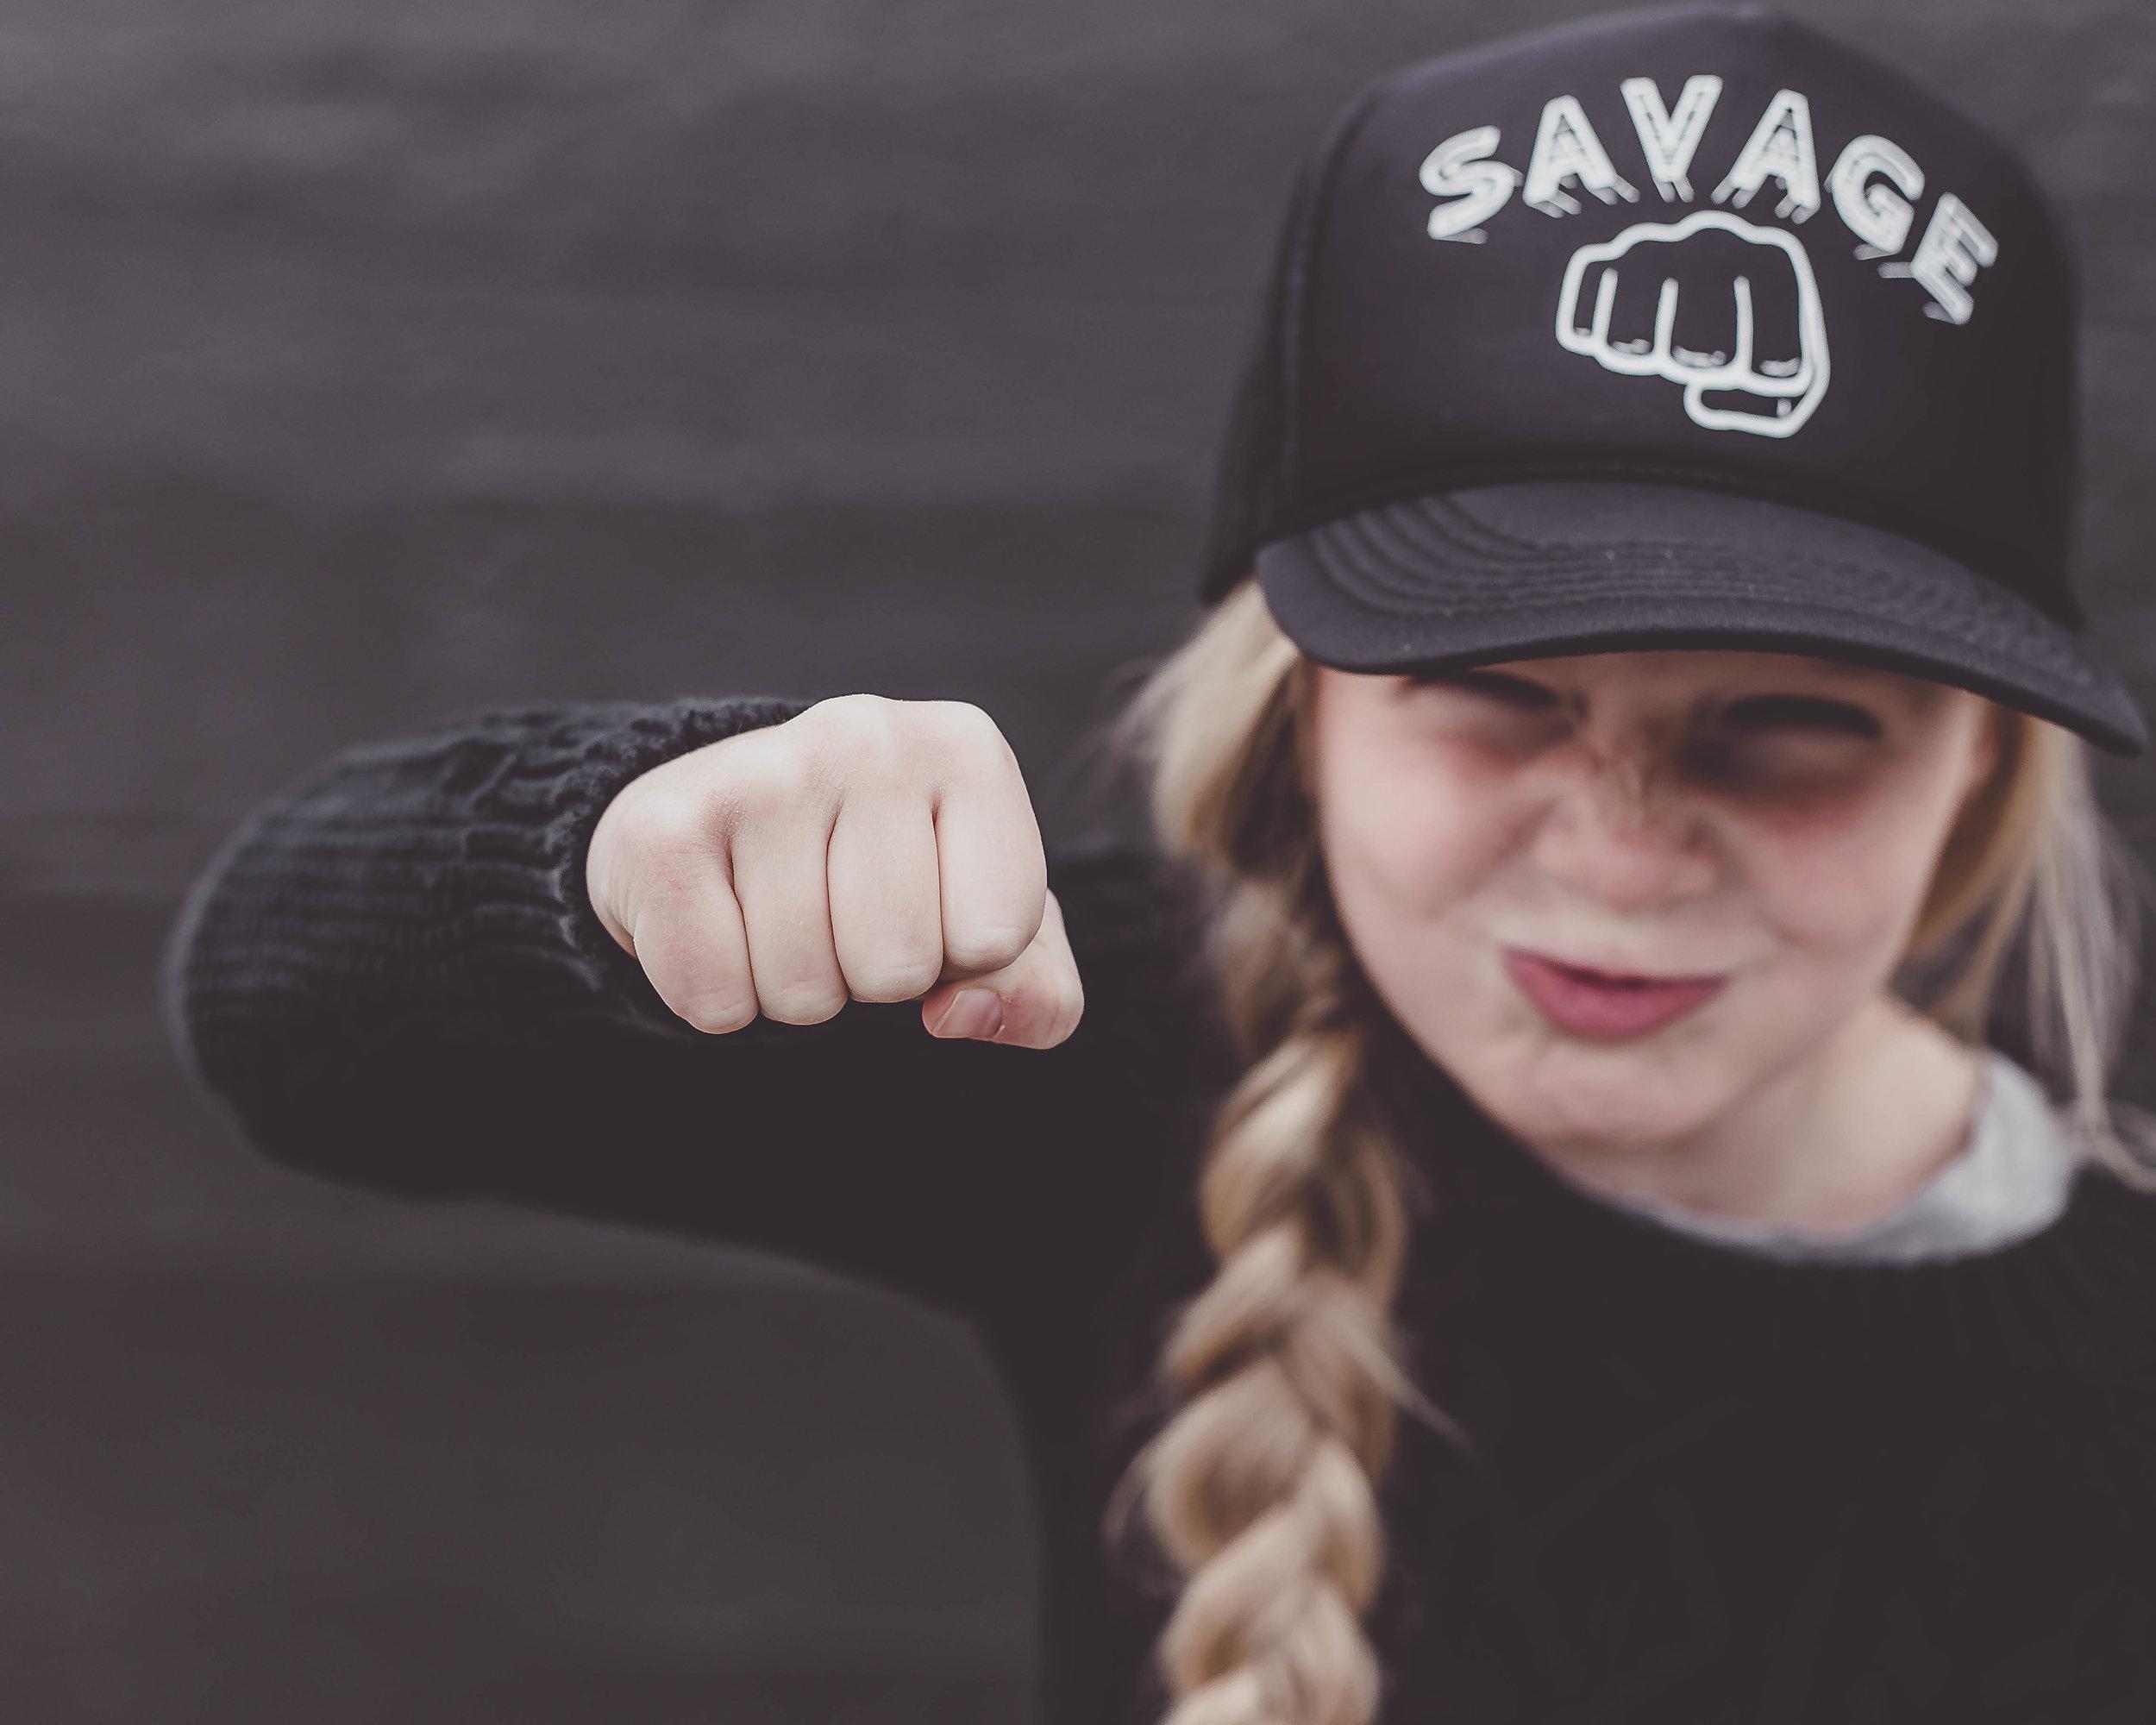 SAVAGE-6.jpg